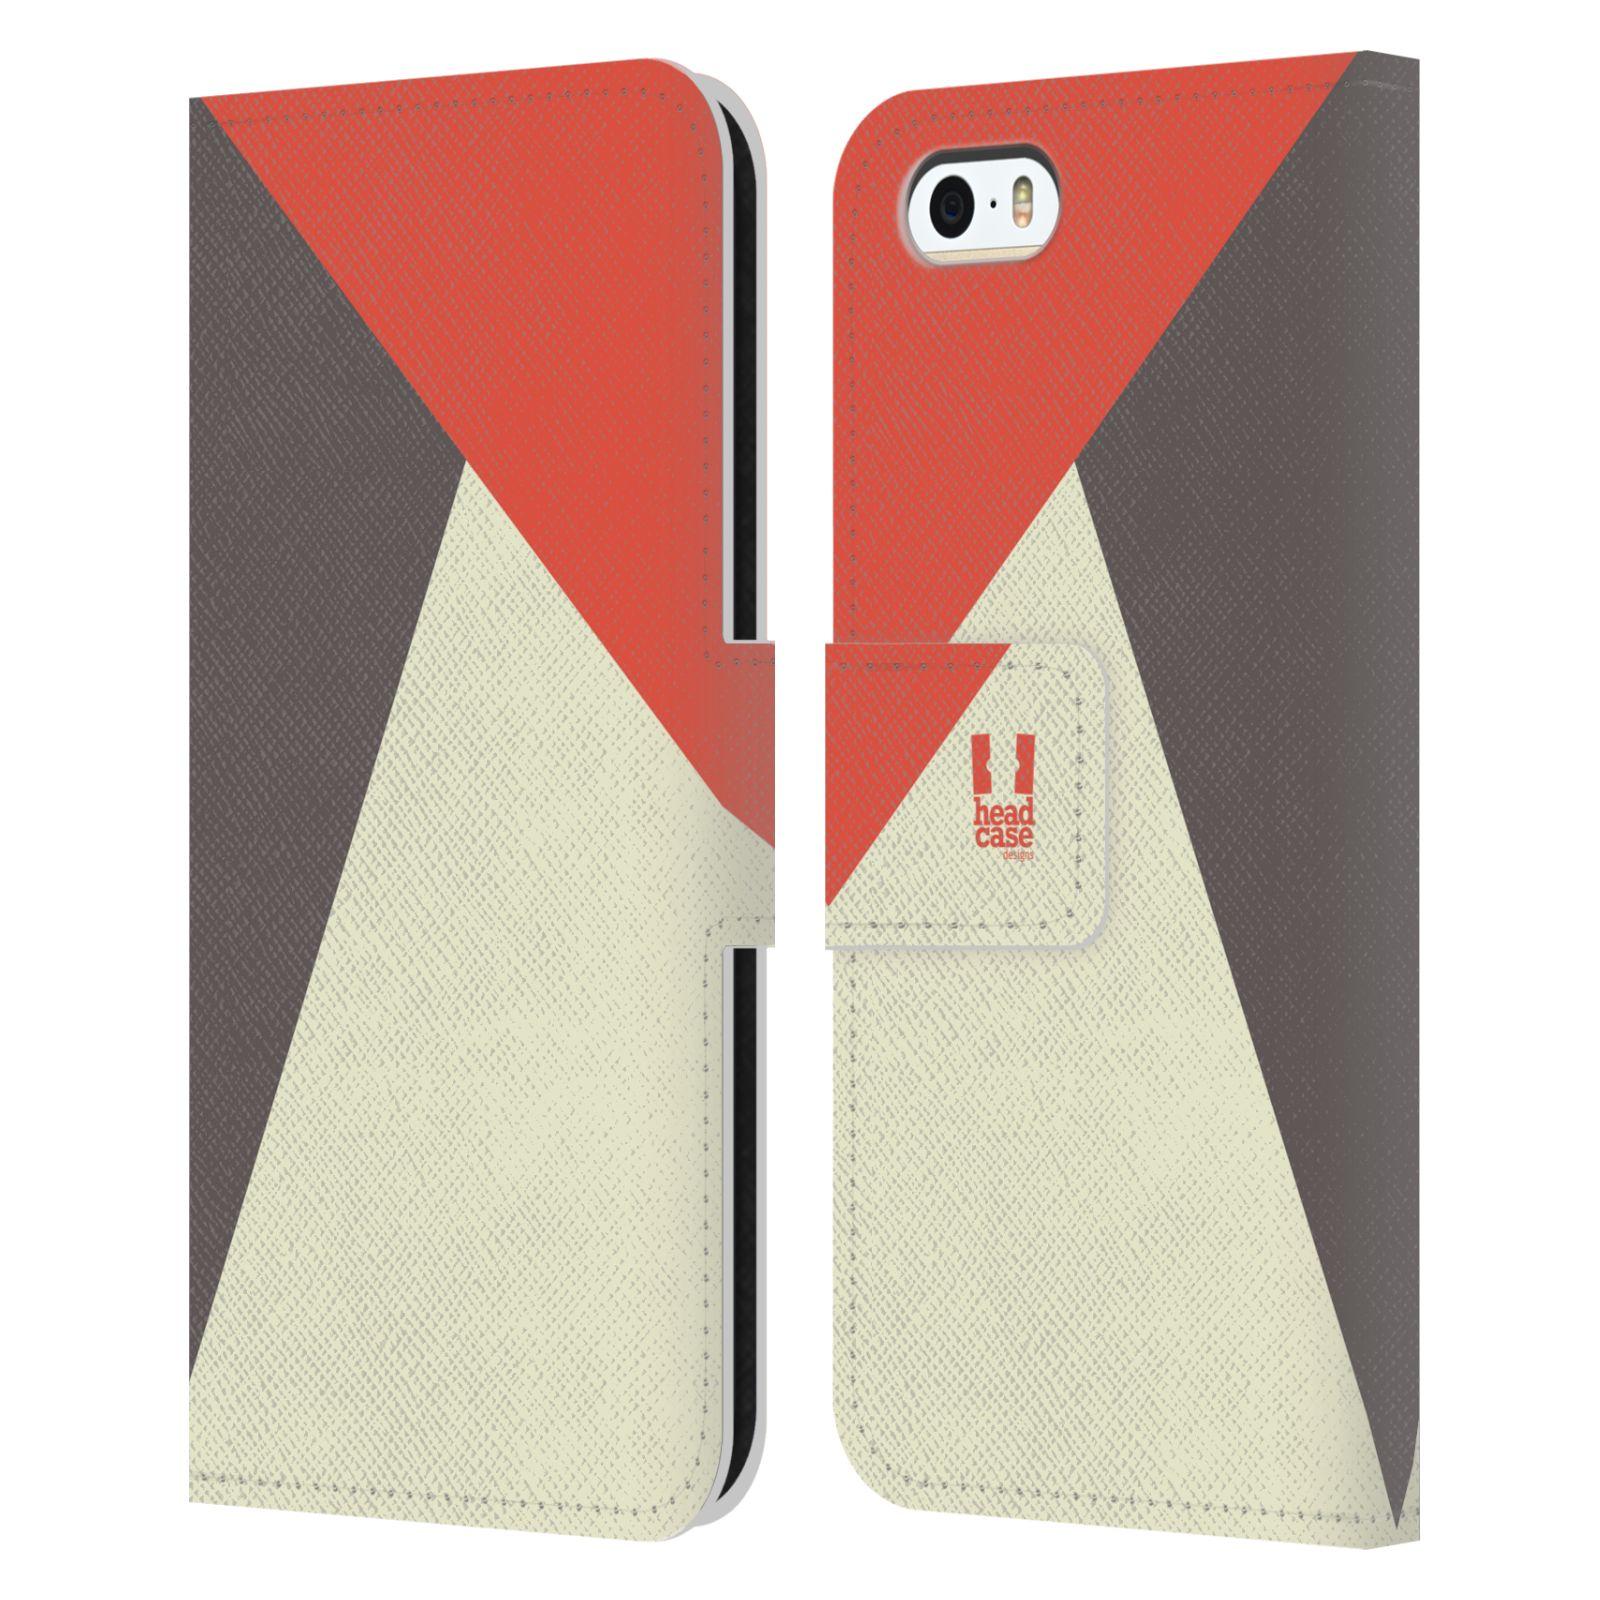 HEAD CASE Flipové pouzdro pro mobil Apple Iphone 5/5S barevné tvary červená a šedá COOL